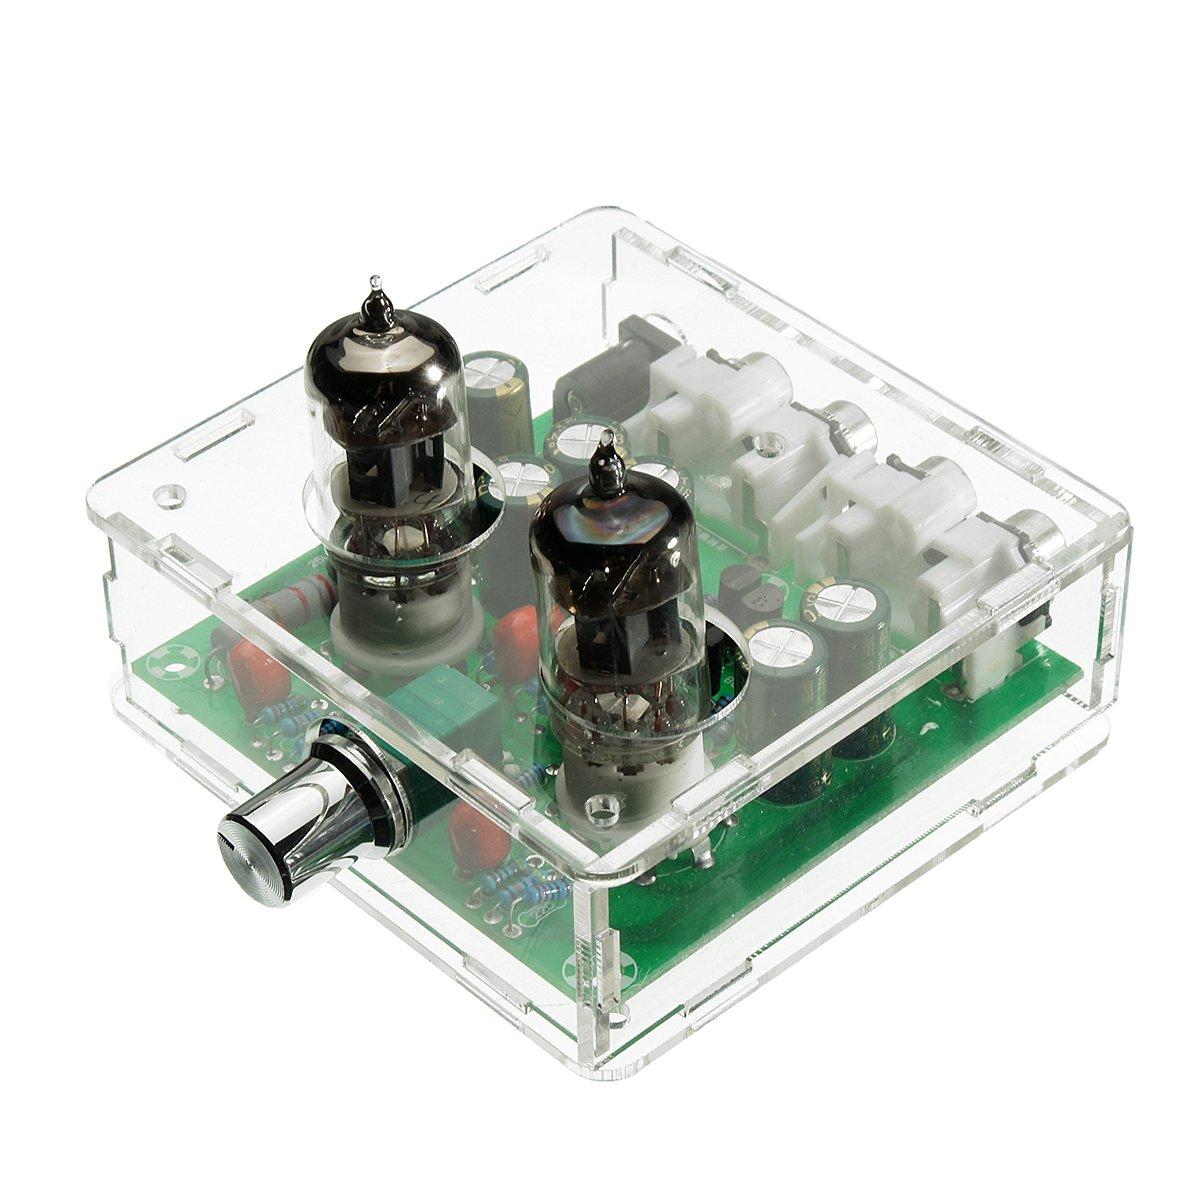 SODIAL CA 12V 6J1 Tubo de preamplificador de valvula Tablero de preamplificador Caja de bufer del amplificador de auriculares